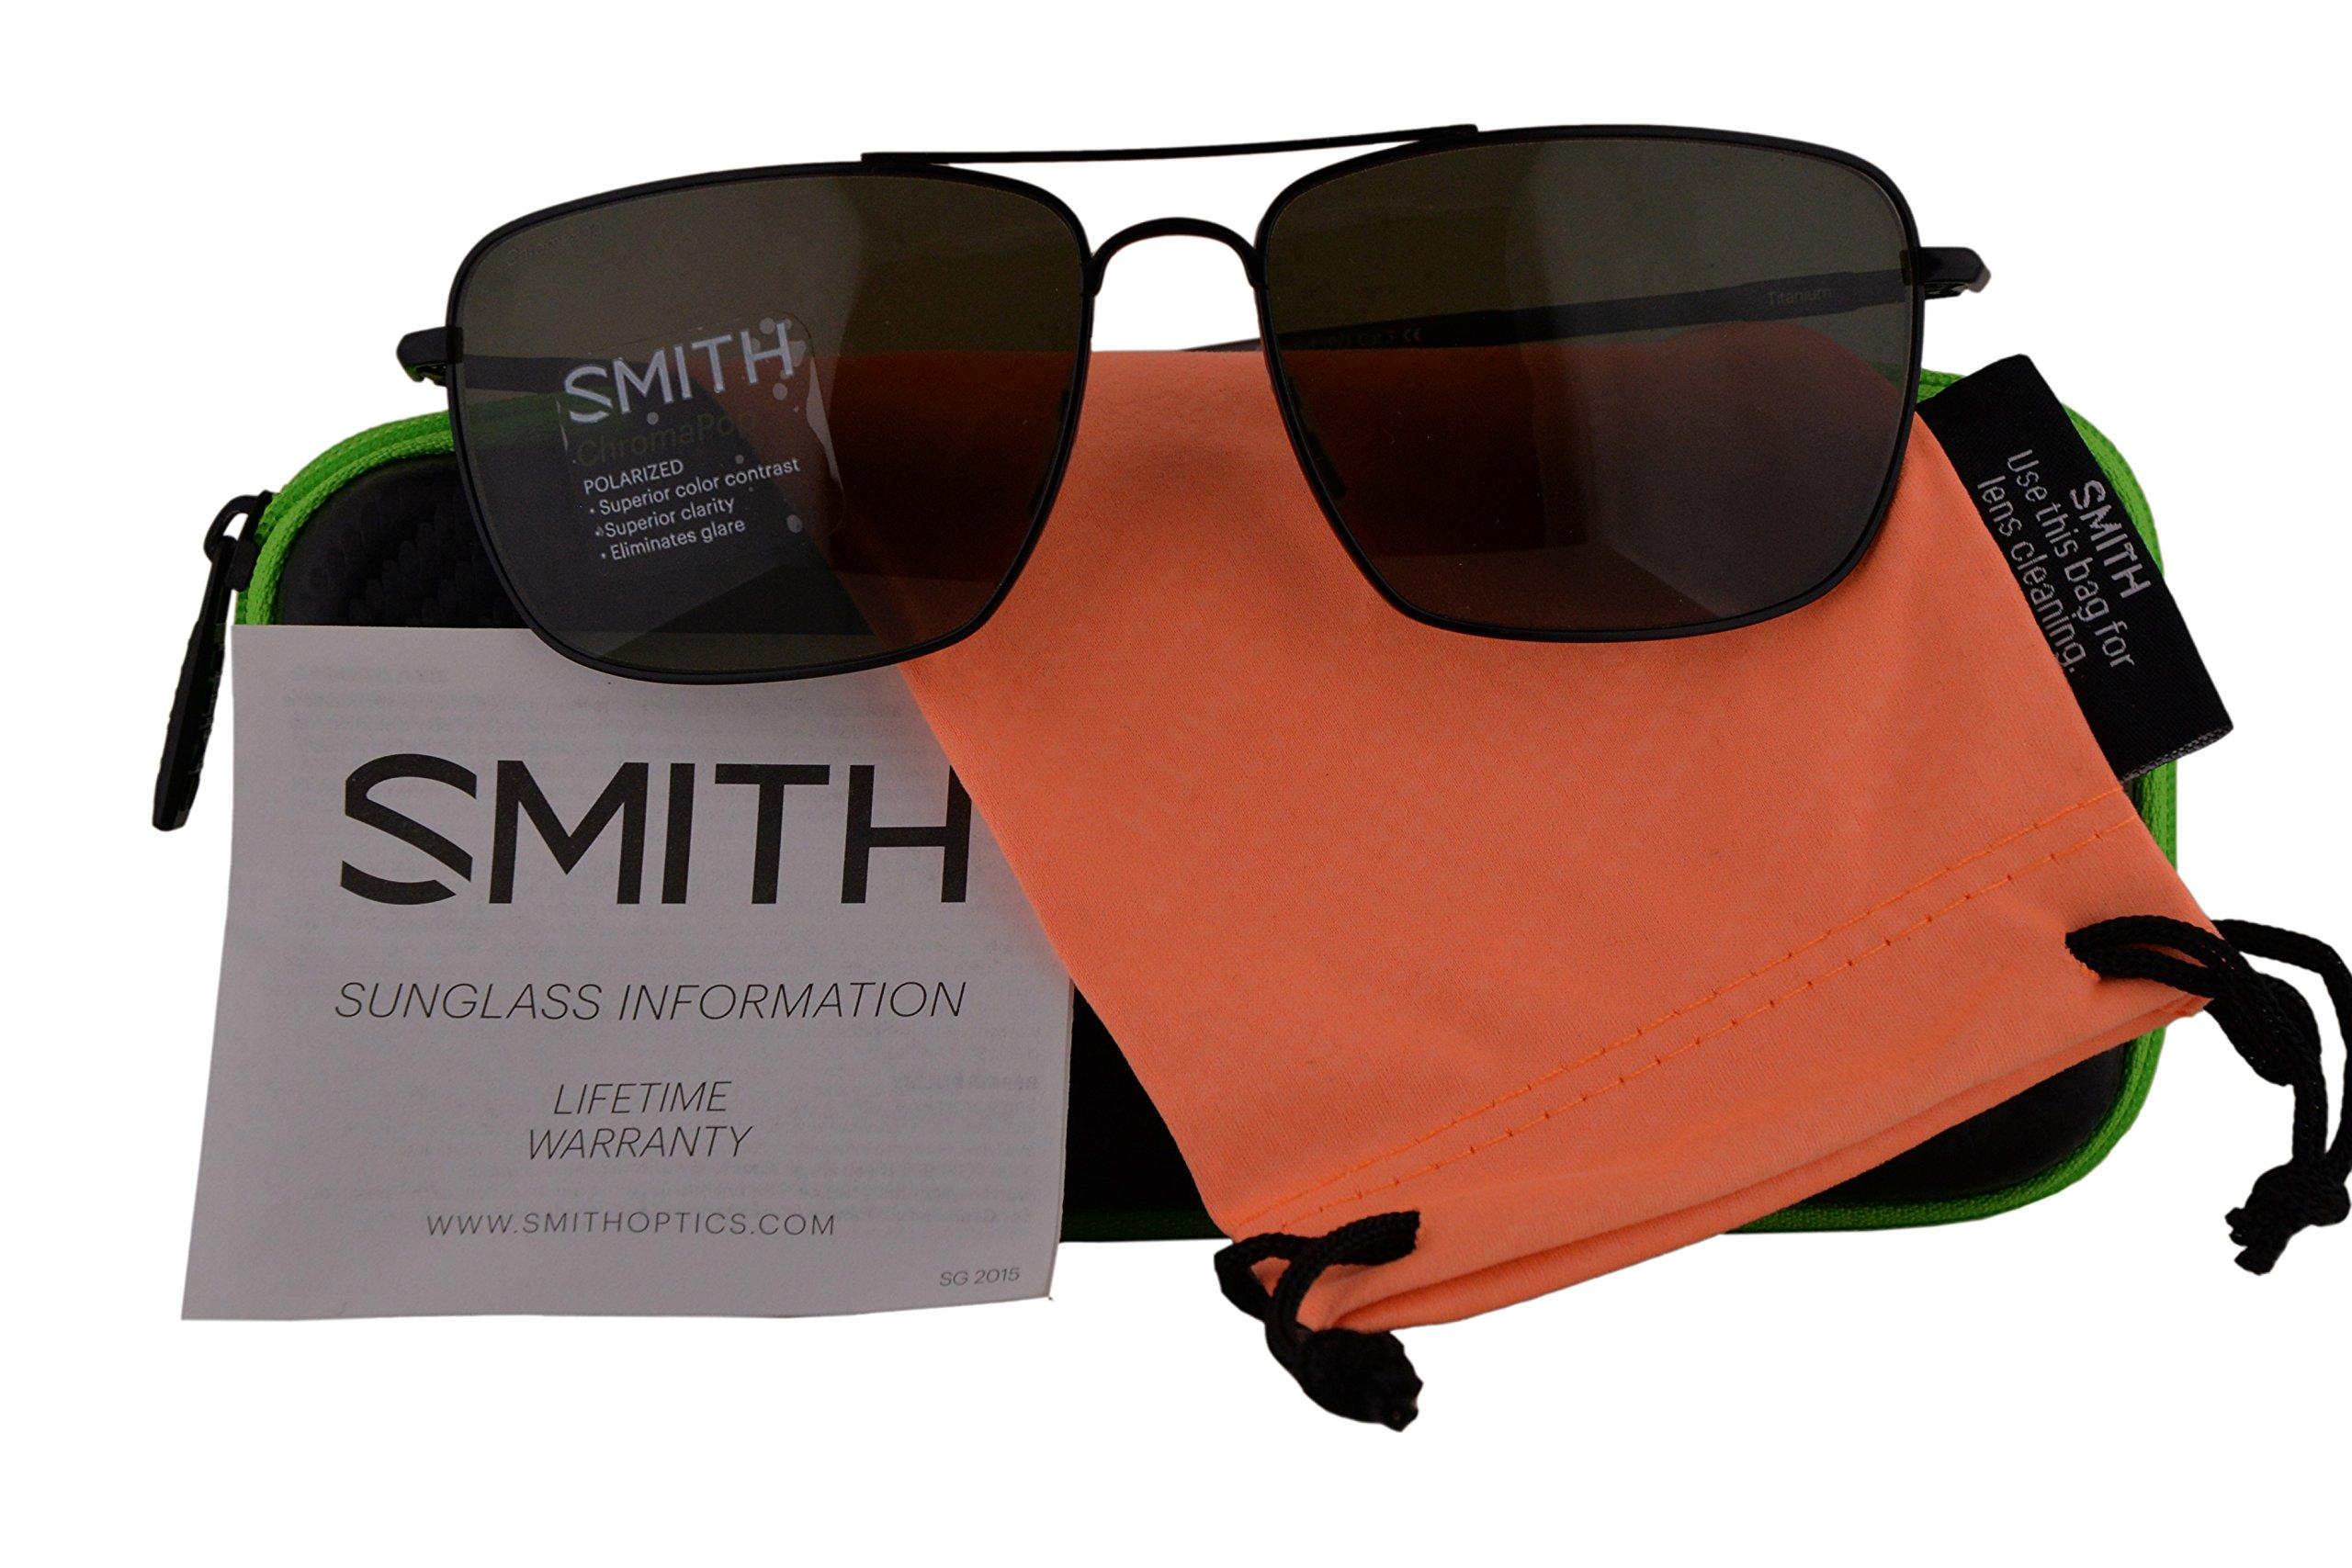 Smith Authentic Sunglasses Nomad Matte Black w/ChromaPop Polarized Grey Green Lens 003 (59mm) Nomad/S